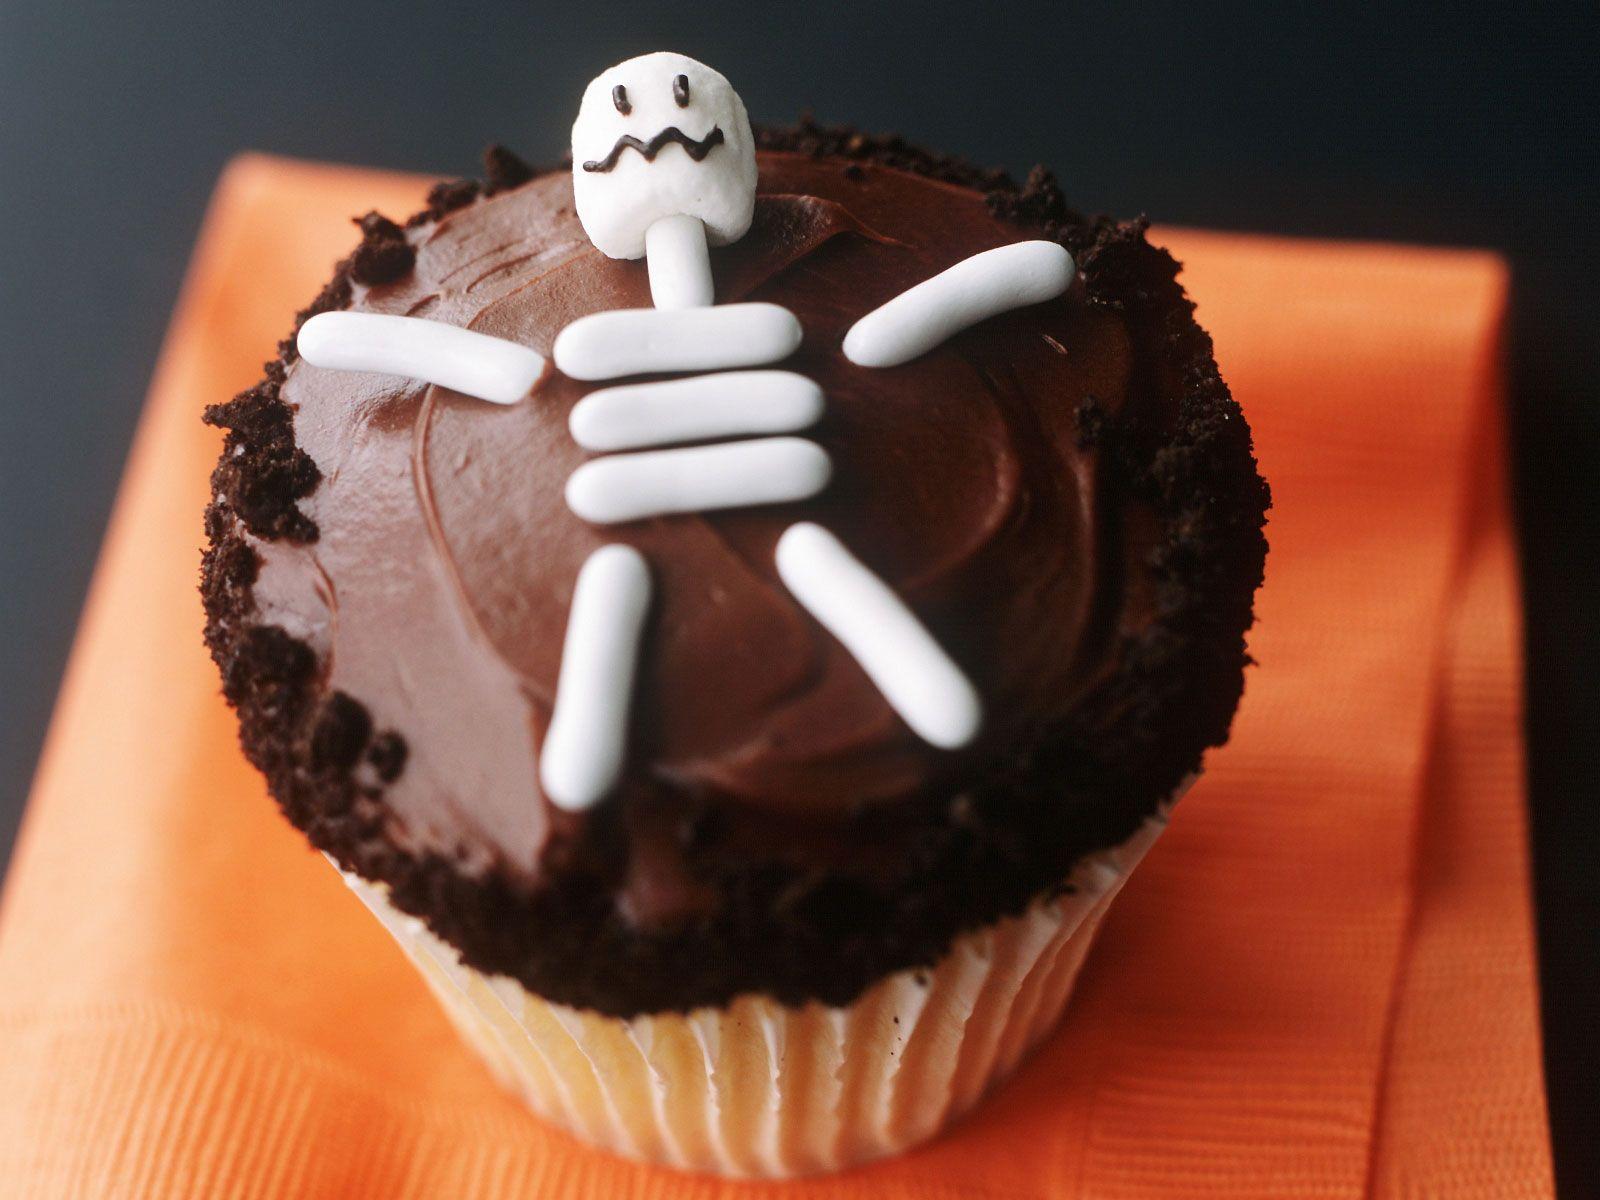 SkelettCupcake für Halloween Rezept Leckere cupcakes